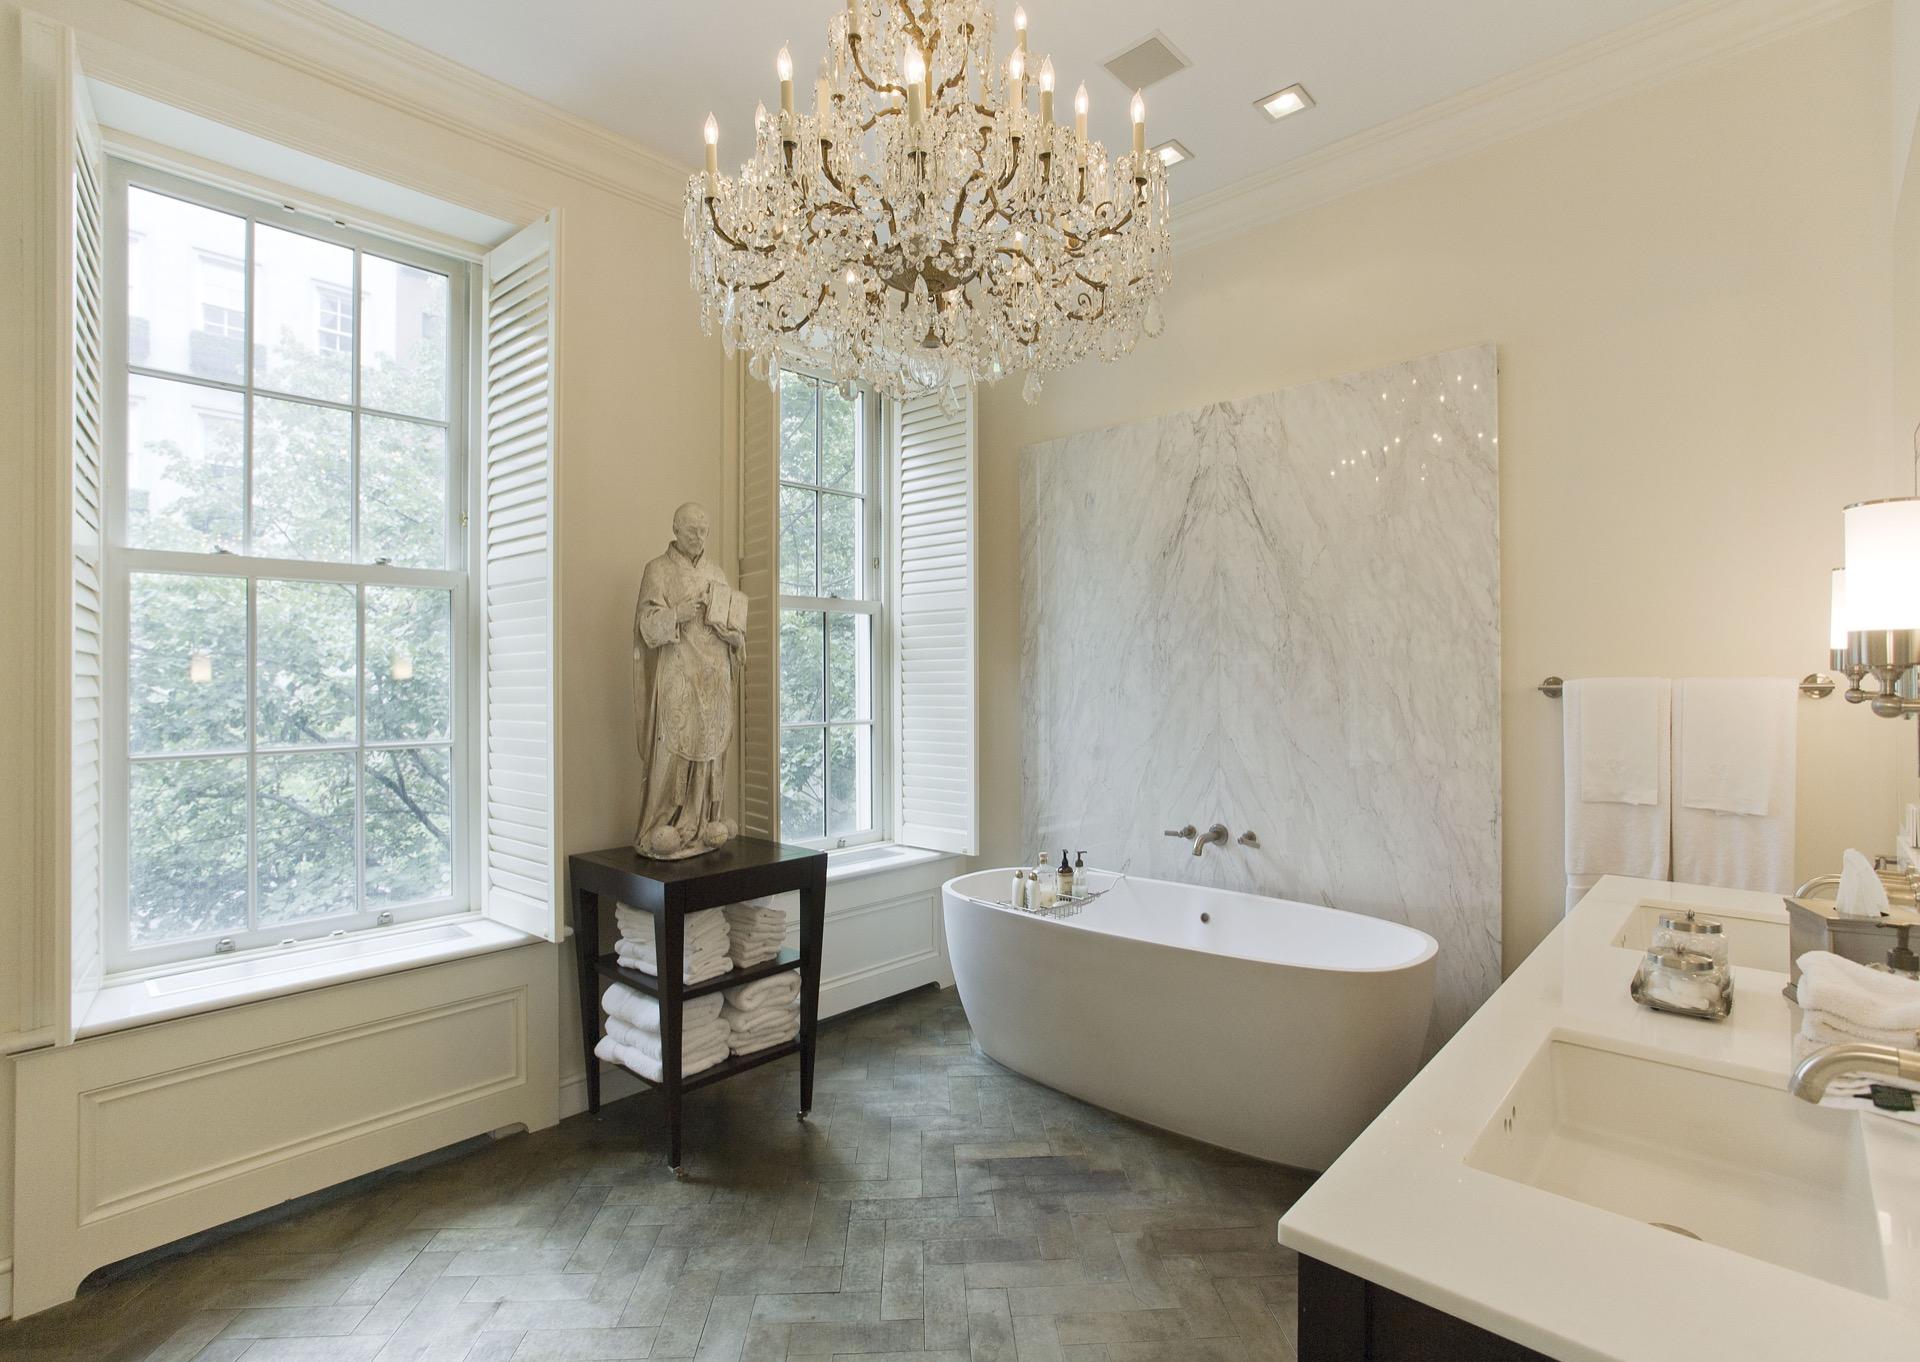 Tara shaw interior design bathroom new york brown stone for Tara louise interior decoration design